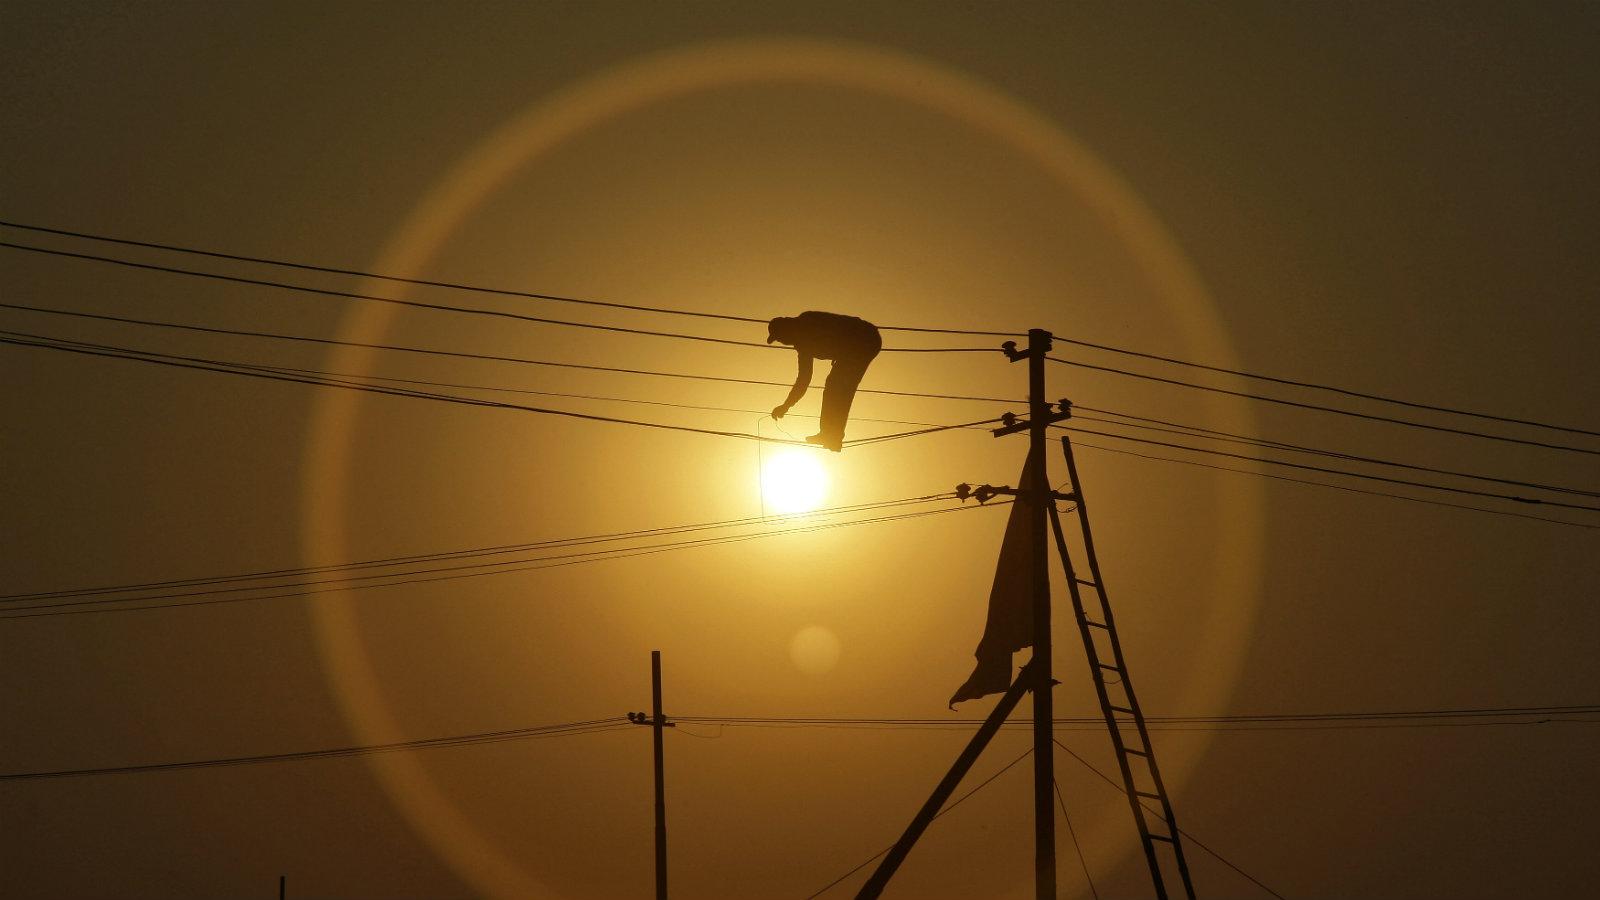 india-electricty-renewables-poor